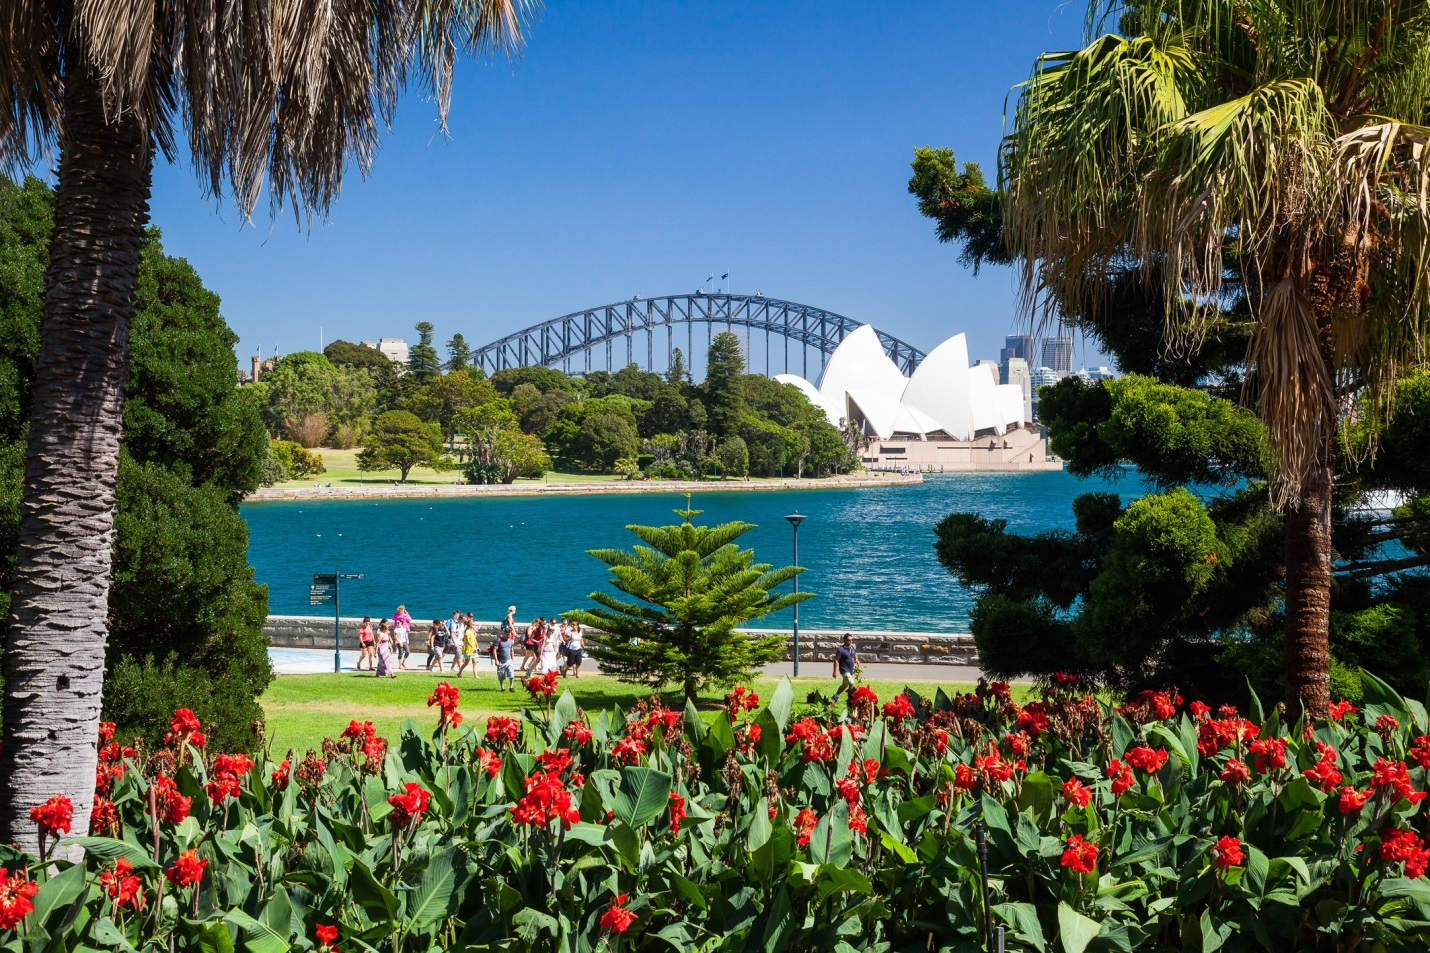 rentalcars24h blog sydney park4 #1 Sydney Sight To Admire Australian Nature!